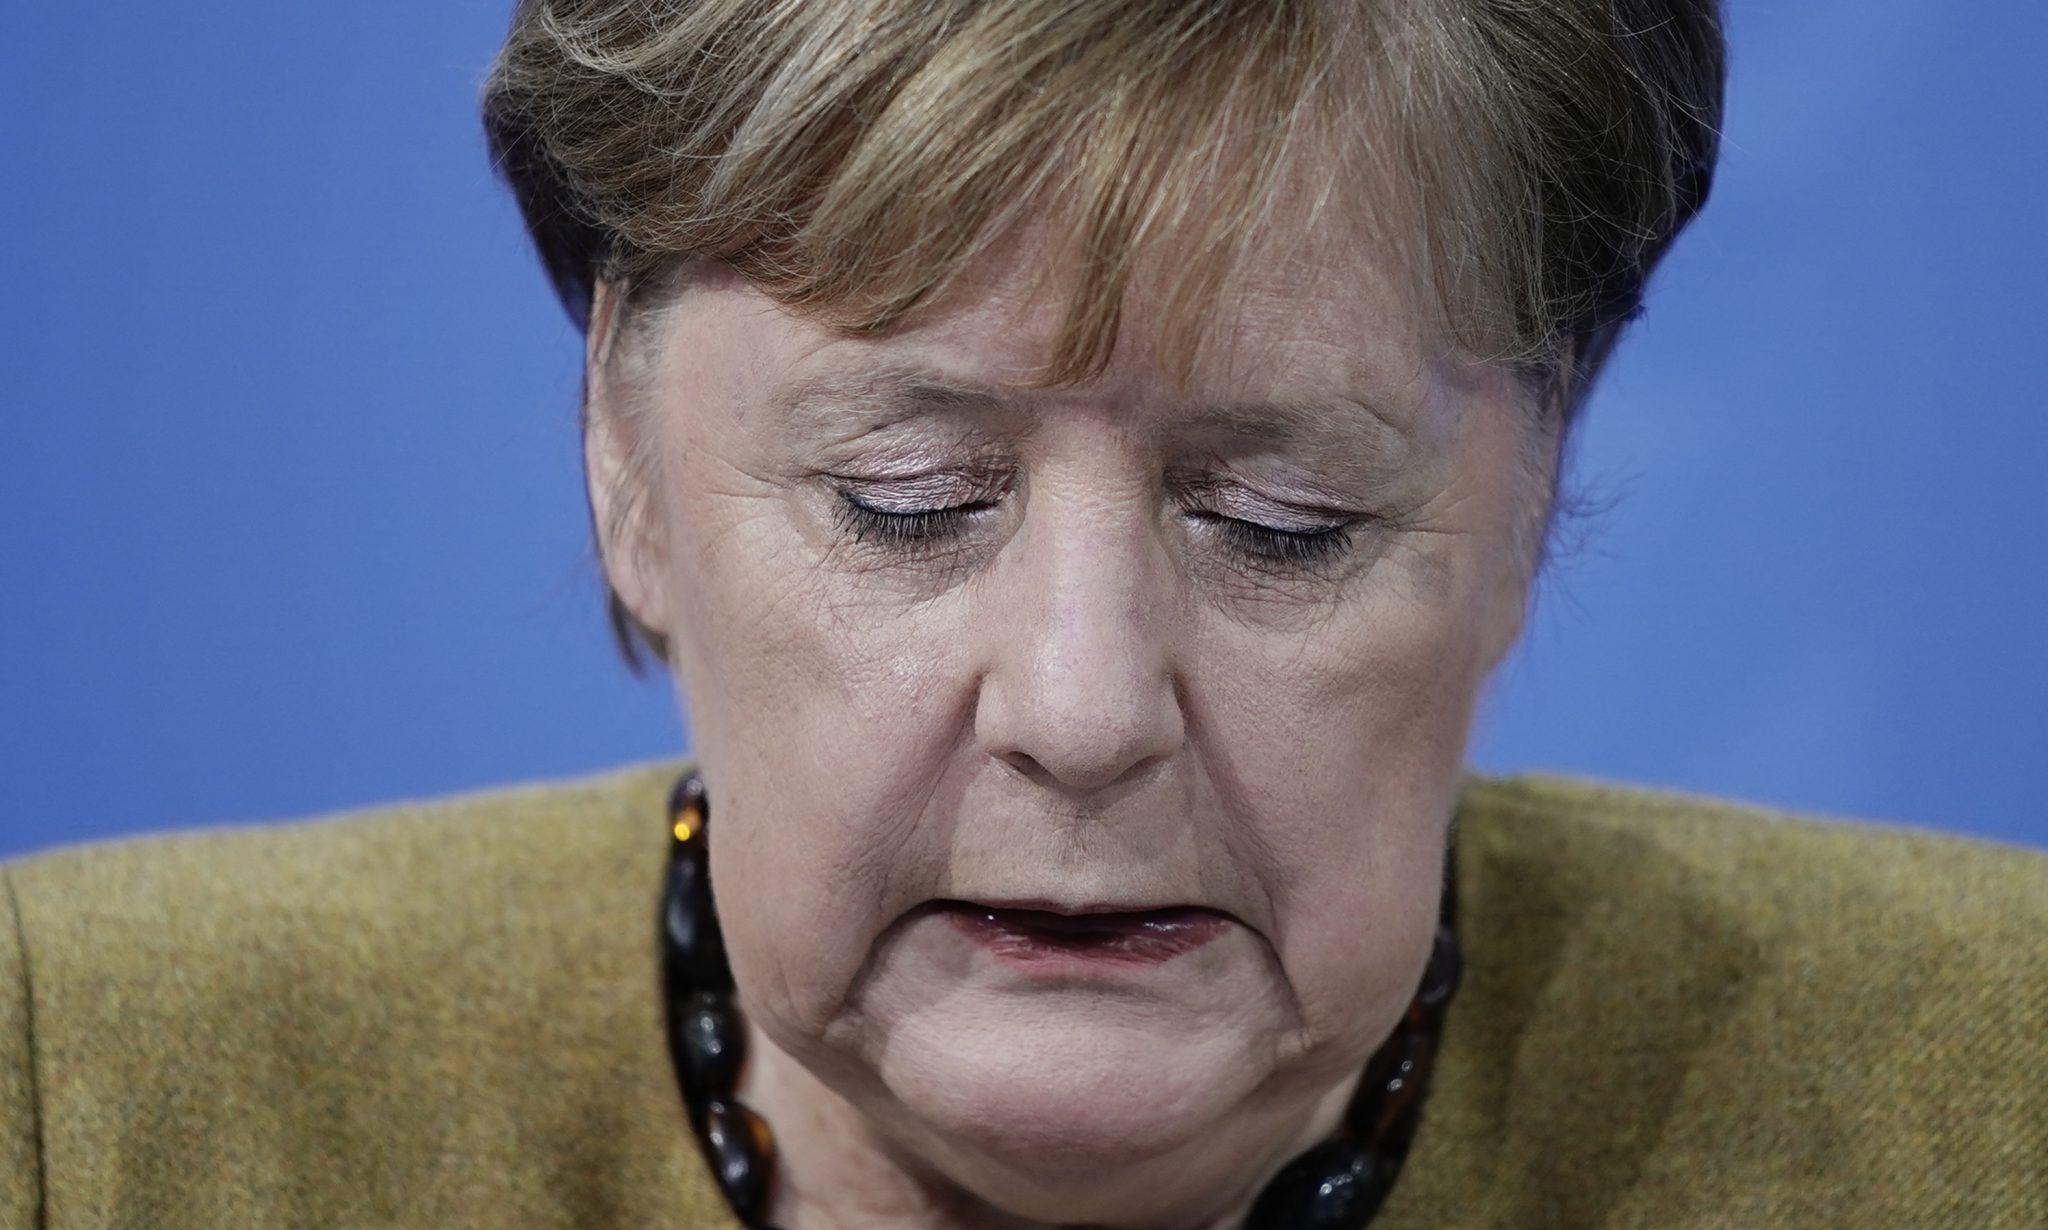 undeskanzlerin Angela Merkel erklärt neue Lockdown-Maßnahmen